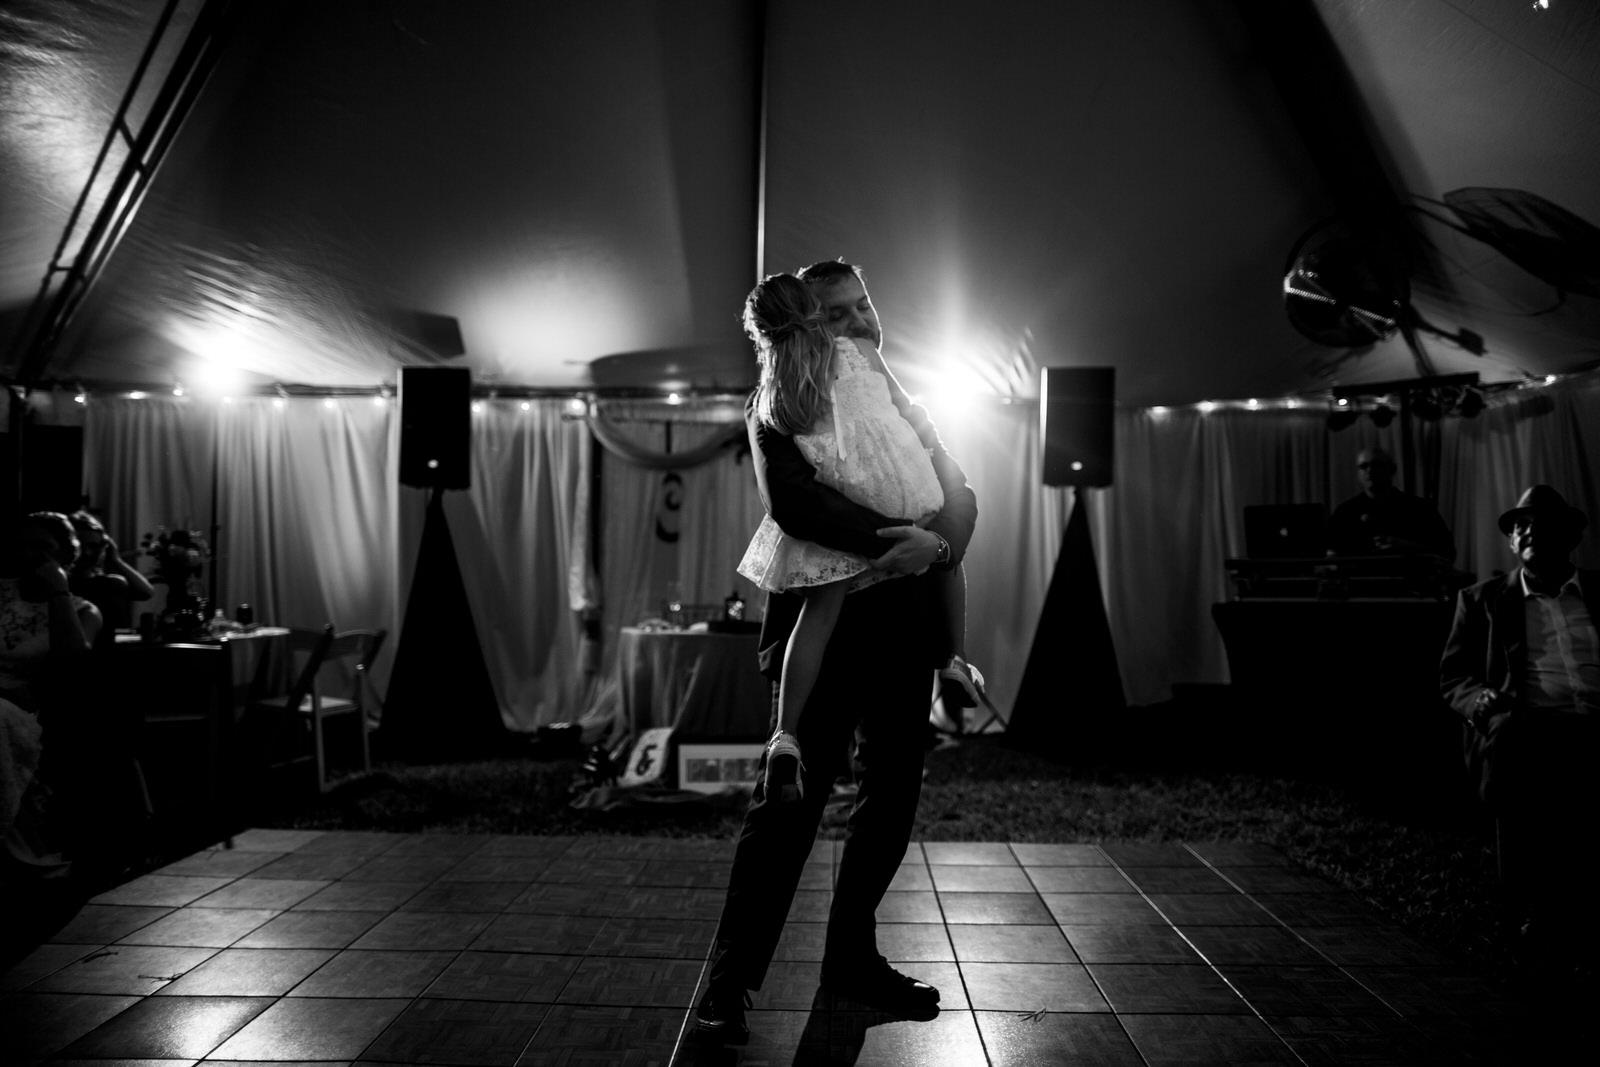 pinecrest_backyard_wedding_tiny_house_photo_reception-163.jpg